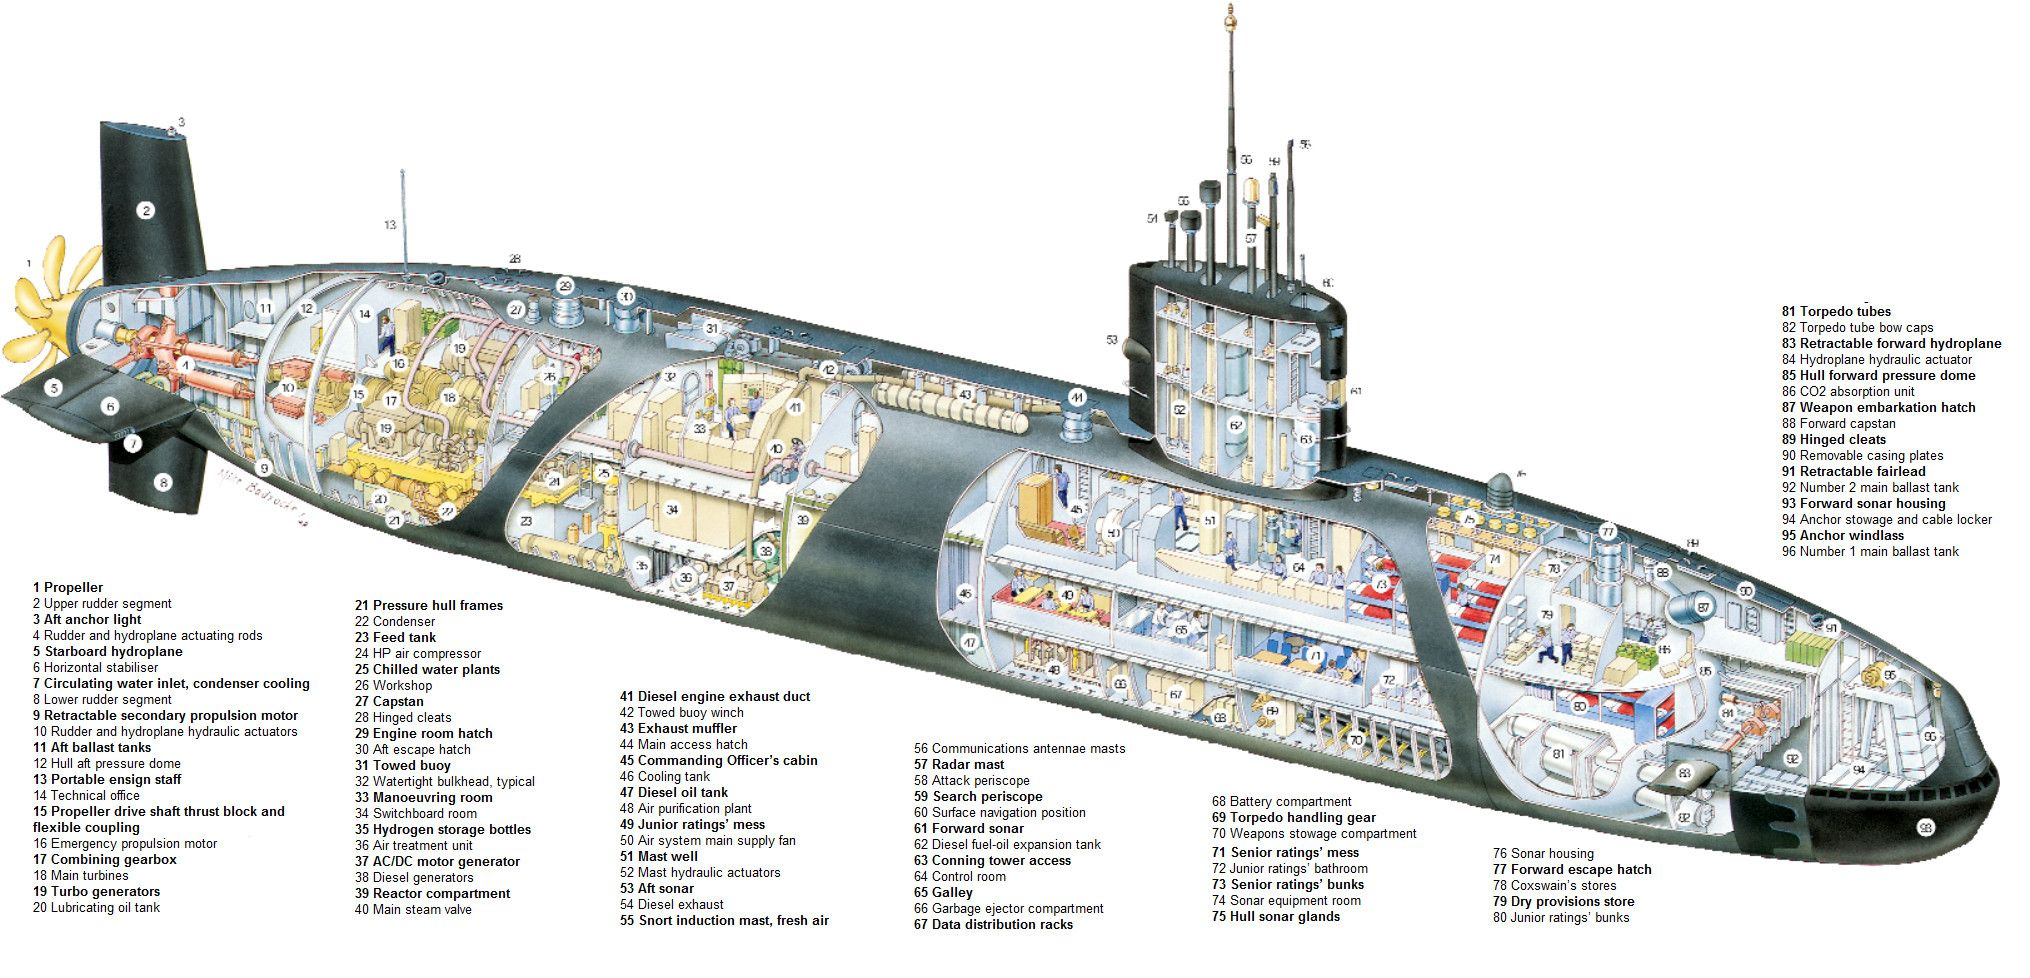 medium resolution of trafalgar class submarine cutaway